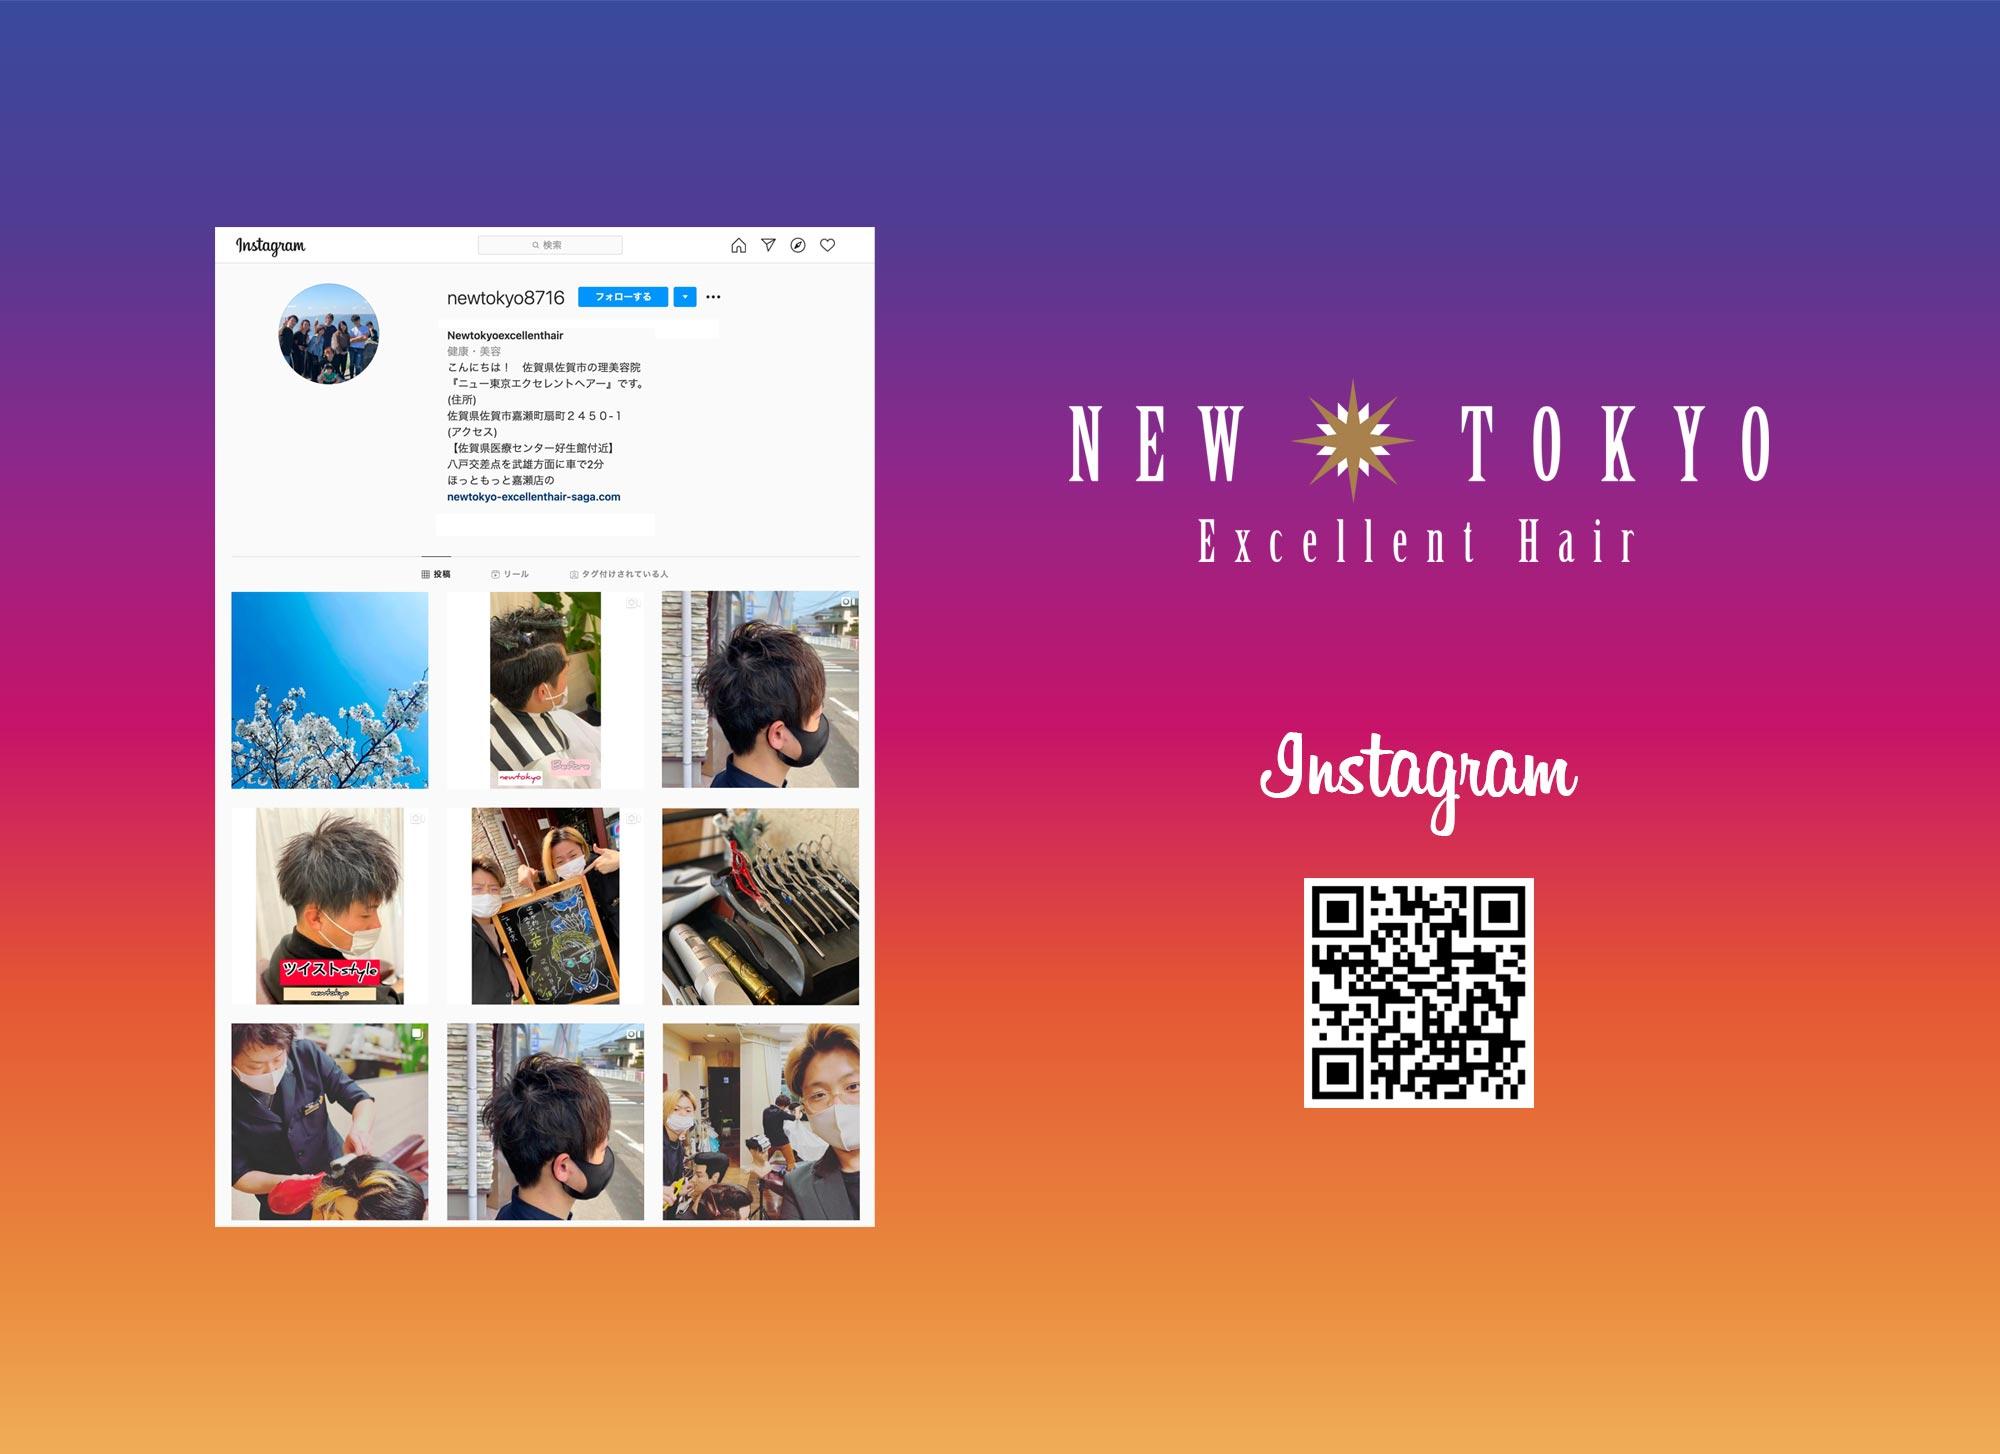 NEW TOKYO Excellent Hair Instagram